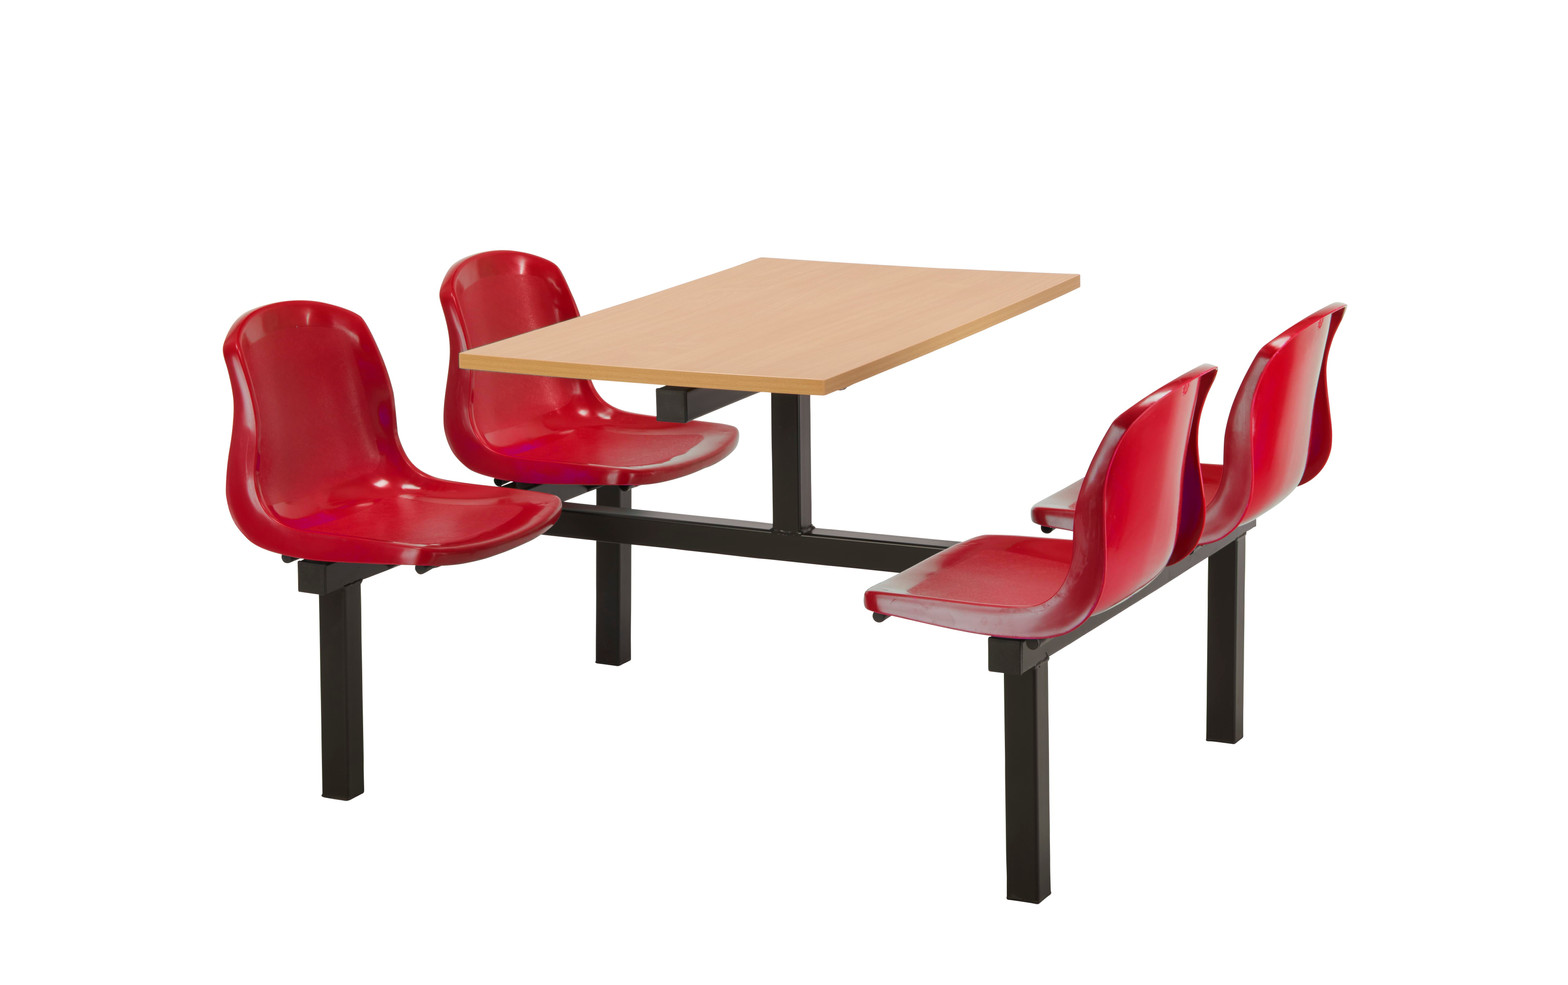 CU90-4S2-RED - BEECH